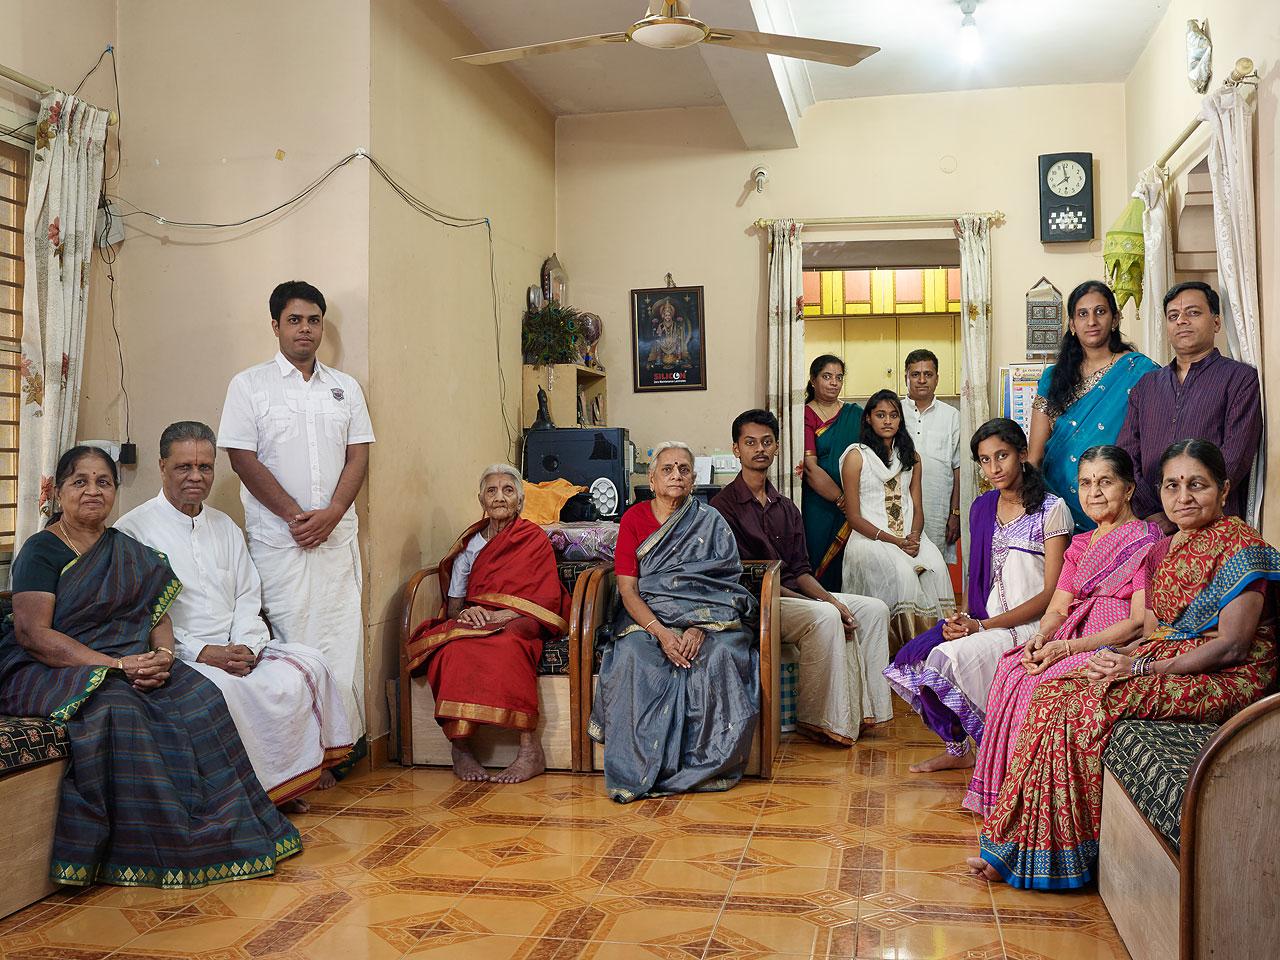 Nora Bibel - FAMILY COMES FIRST – Großfamilienporträts in Bangalore, Indien - Felix Schoeller Photoaward